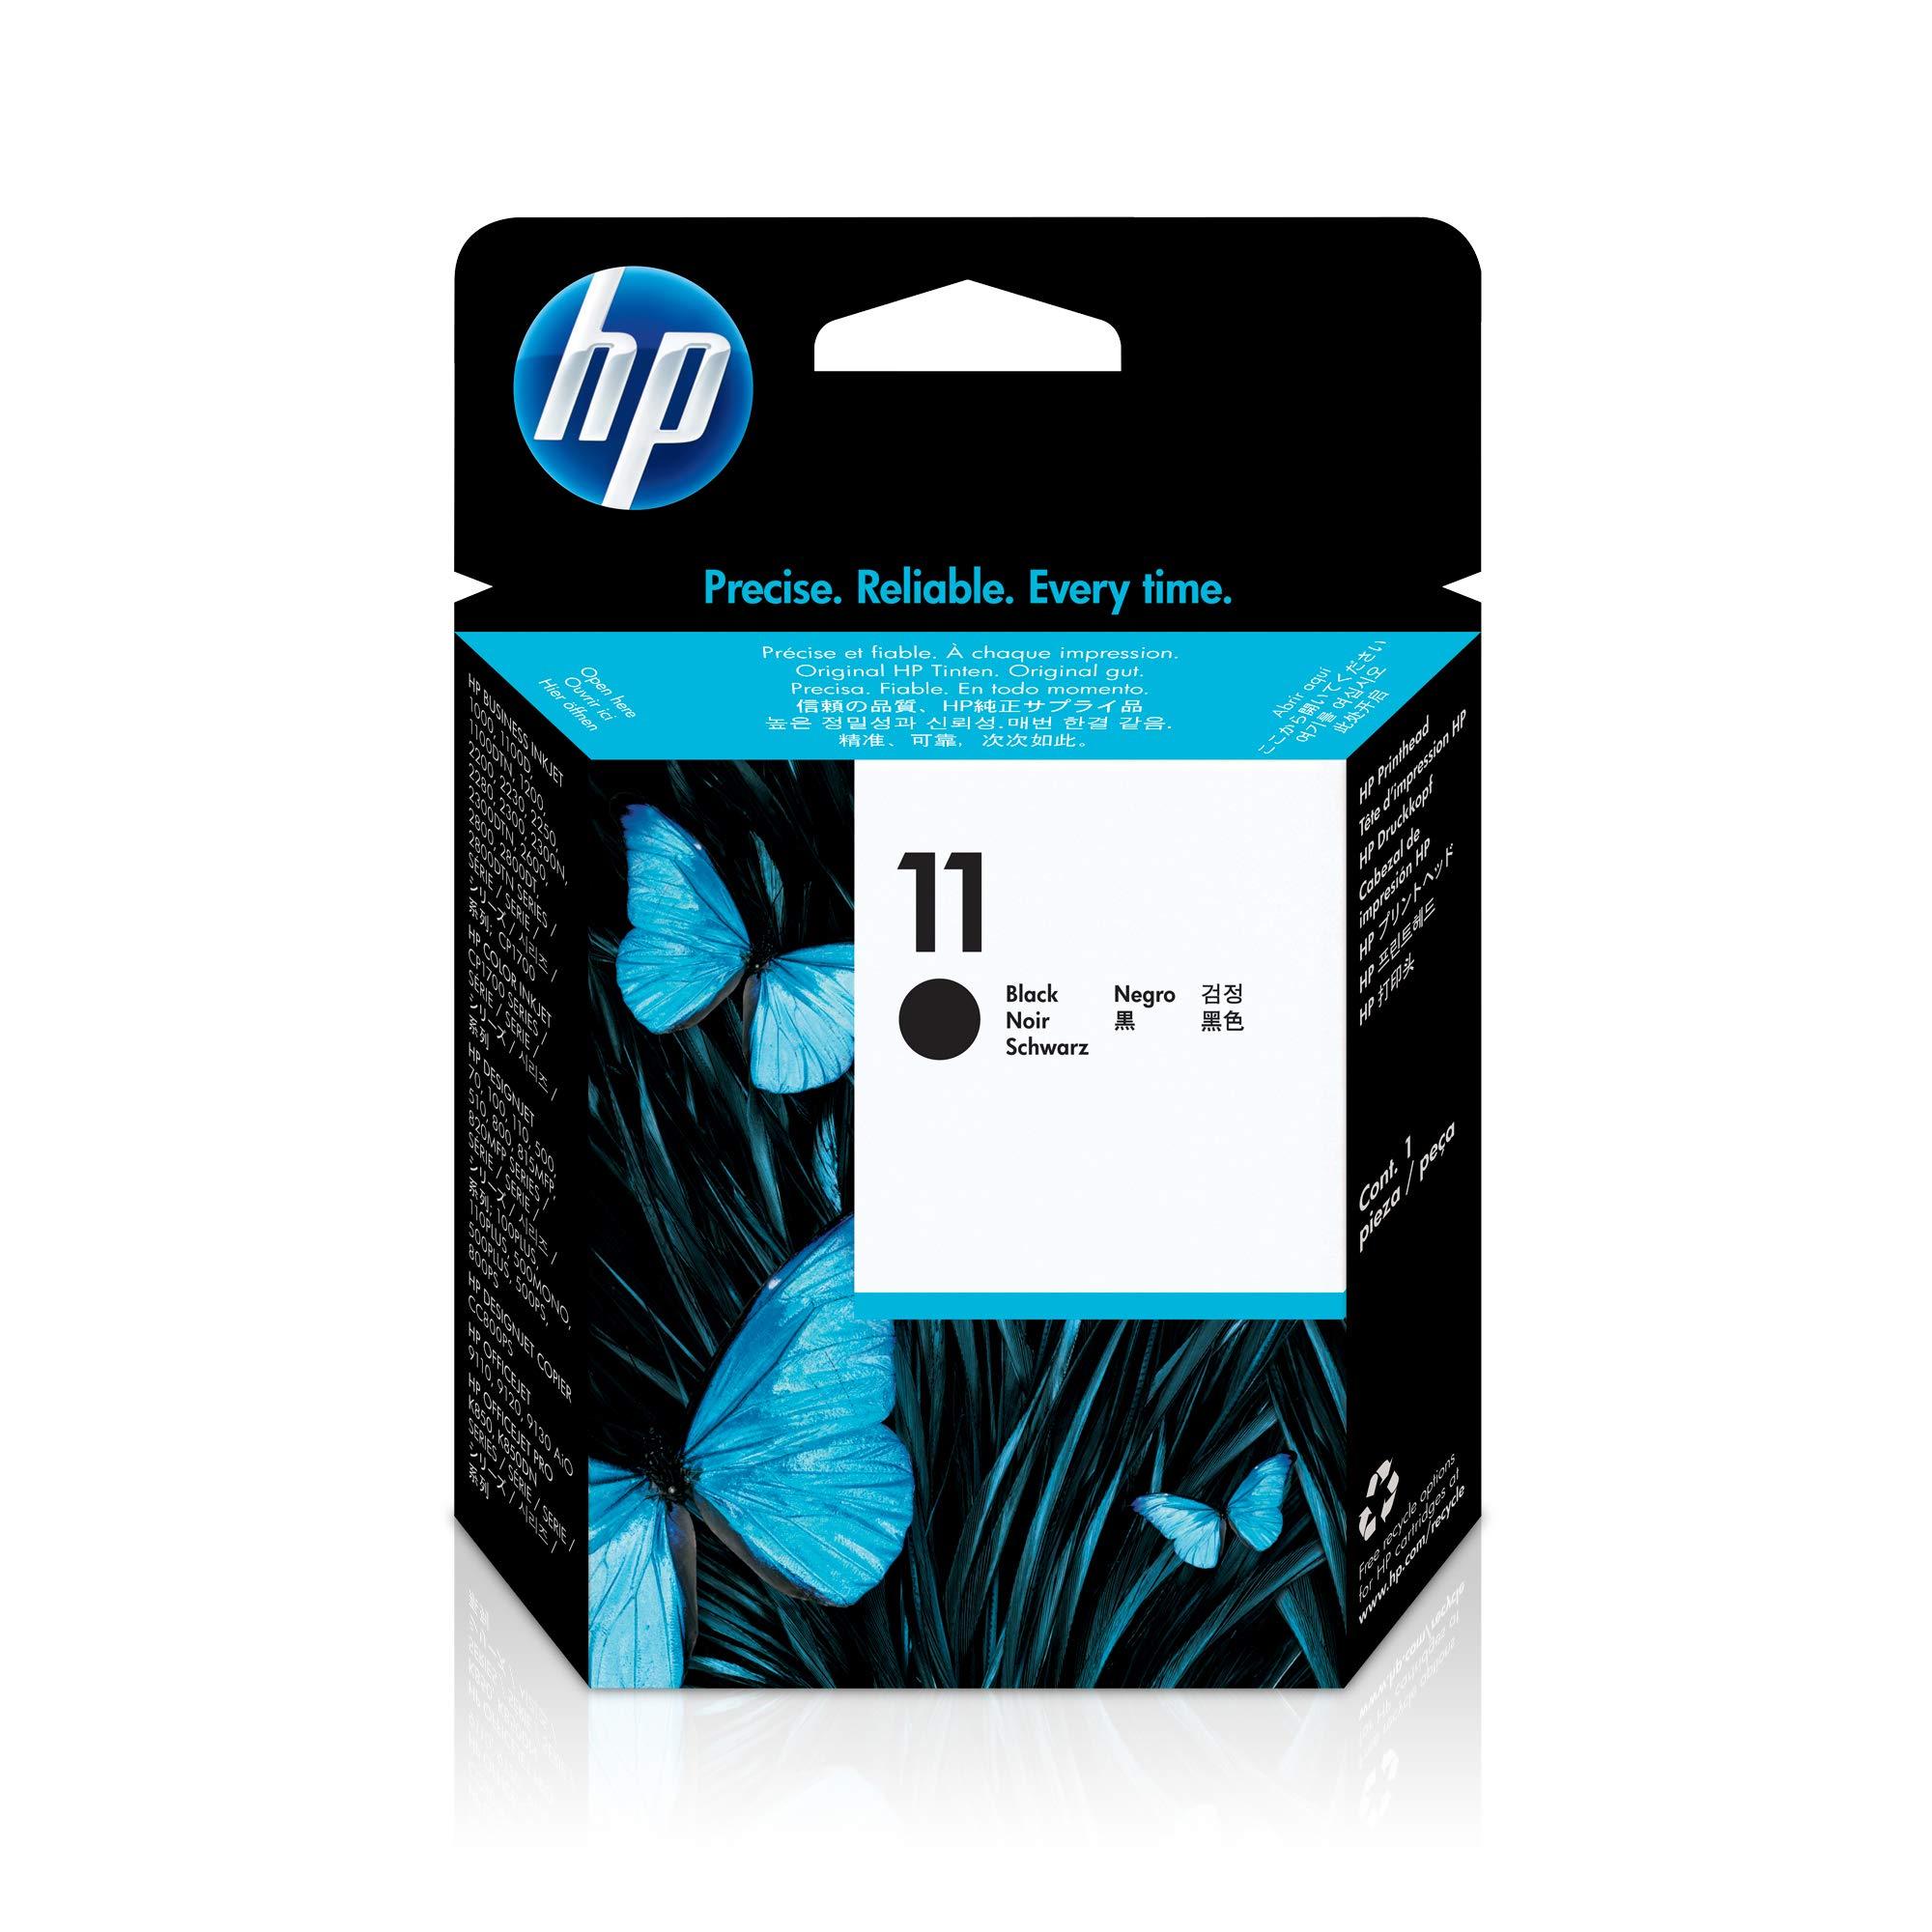 HP 11 | Ink Printhead | Black Printhead | C4810A